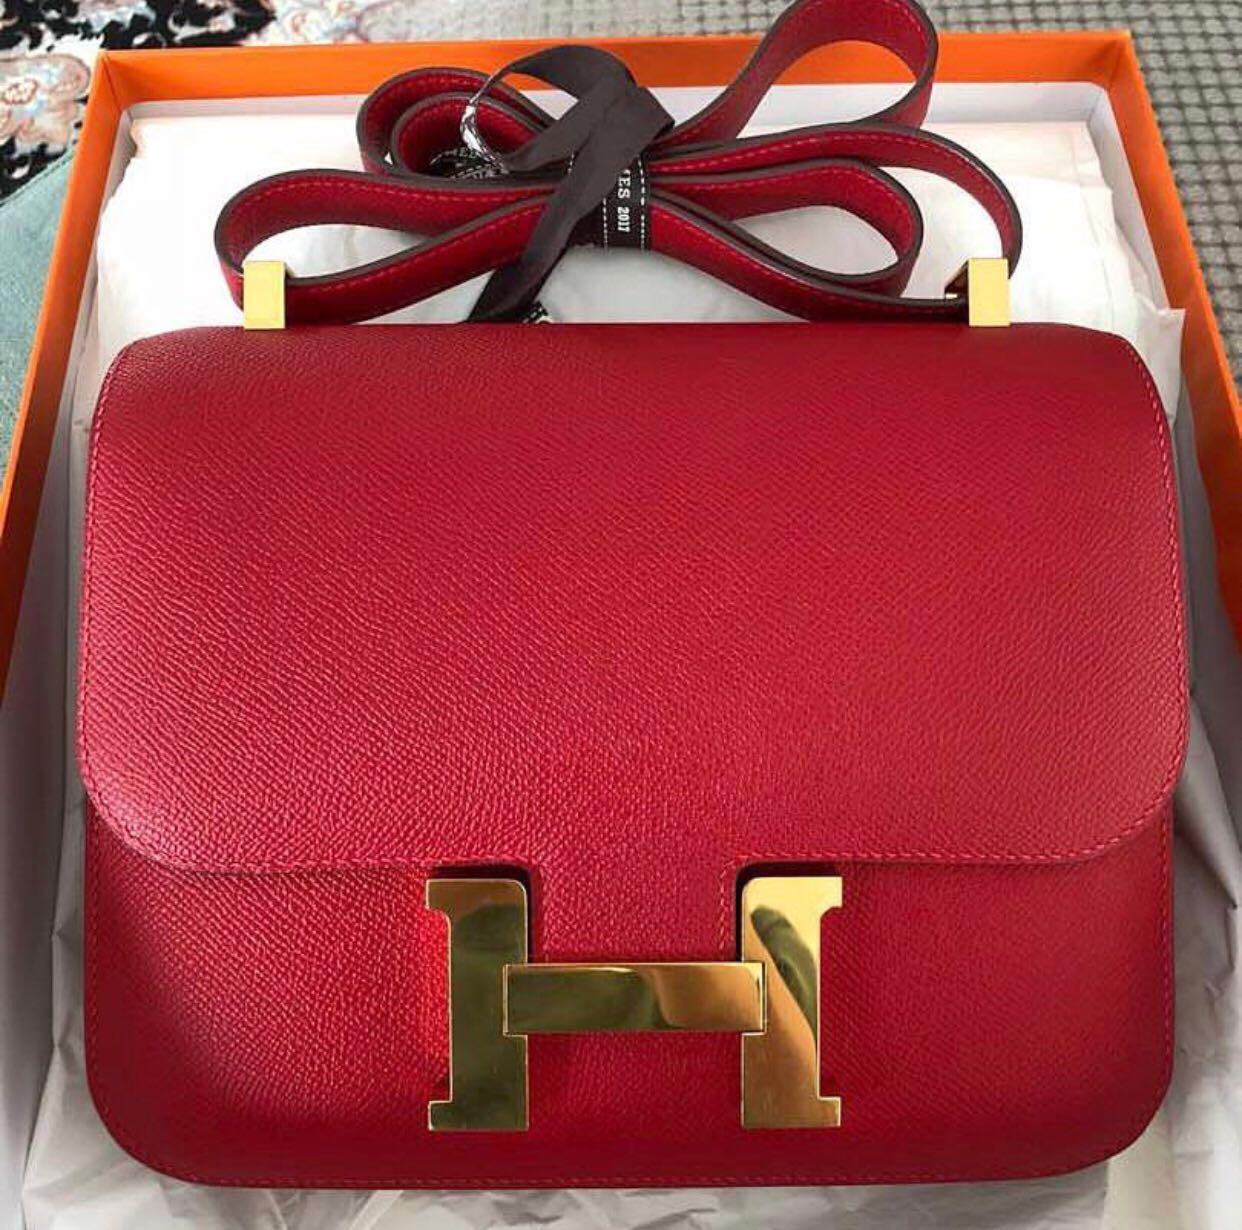 8bcb57f1f0e8 ... mm epsom bag 6d4bb 63c46 canada hermes constance 24 in rouge casaque  barangan mewah beg dan dompet di carousell 271bd 73d9e ...